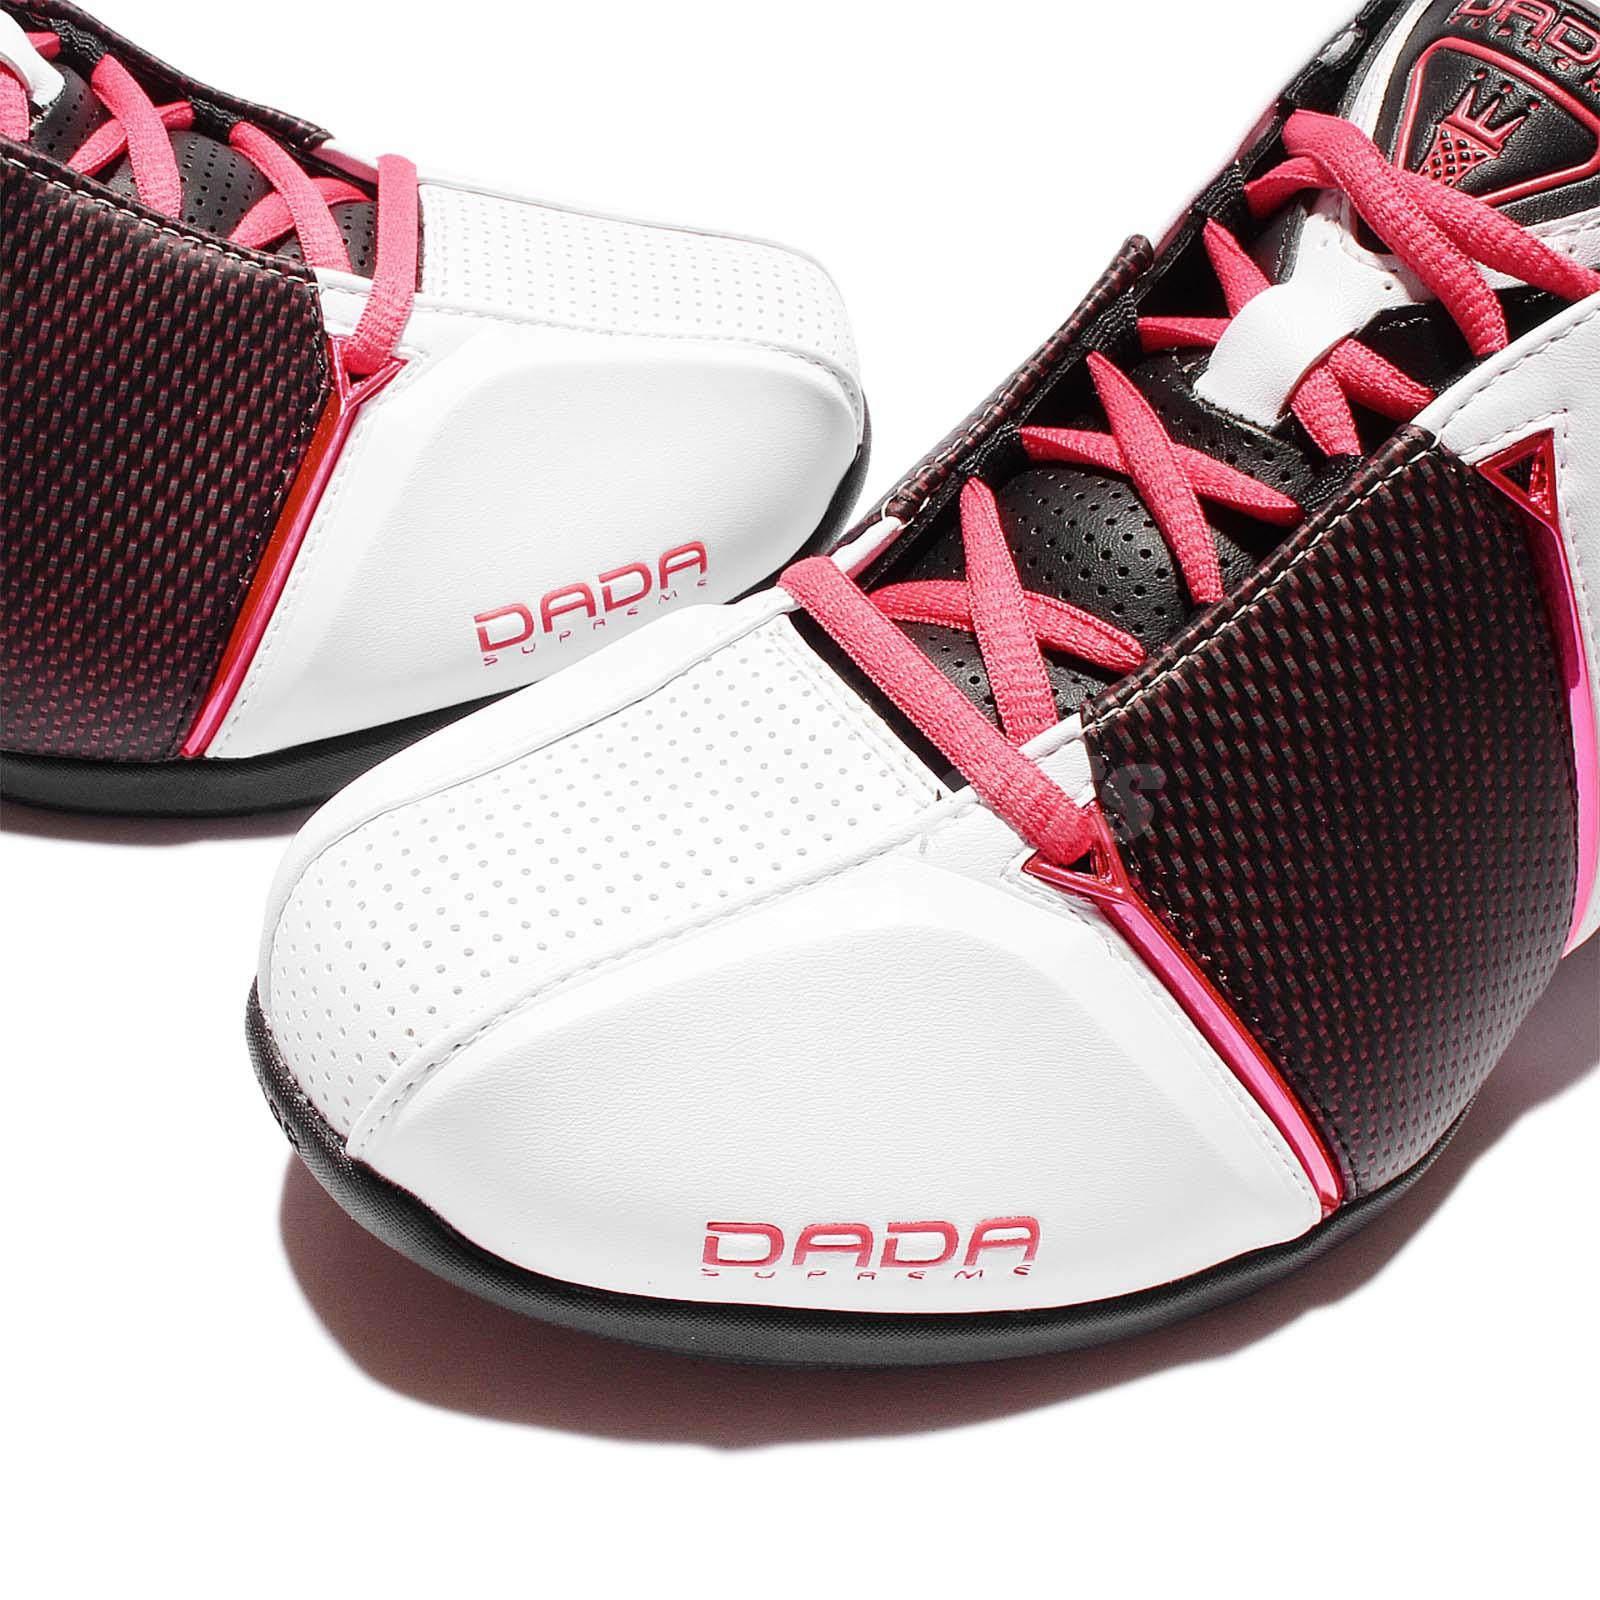 bf9e92b4d380 dada supreme mens dada cdubbz black red basketball sneaker